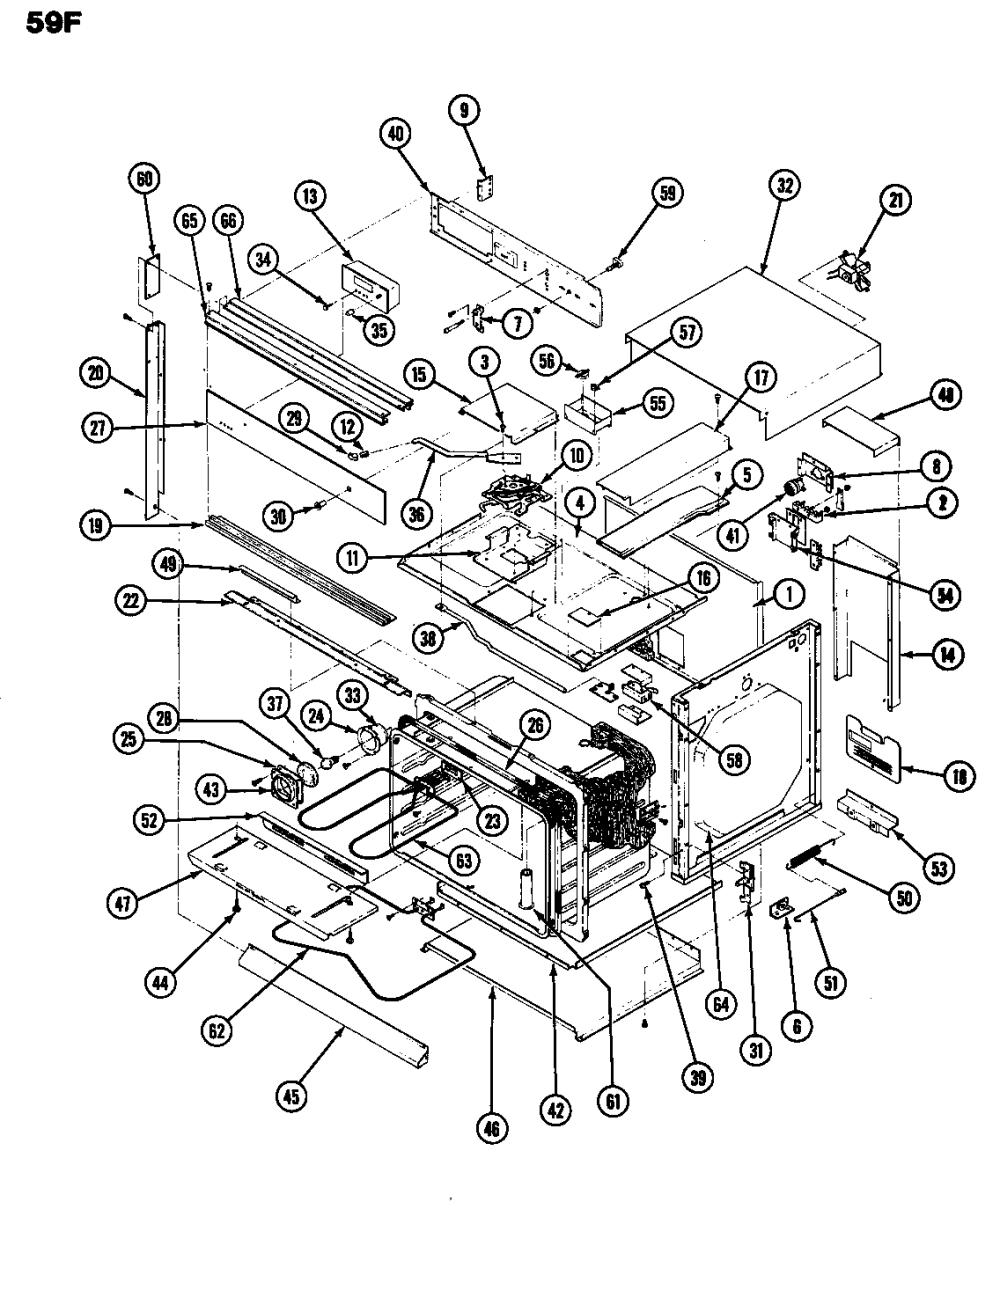 medium resolution of magic chef 59fn 5tvw body diagram